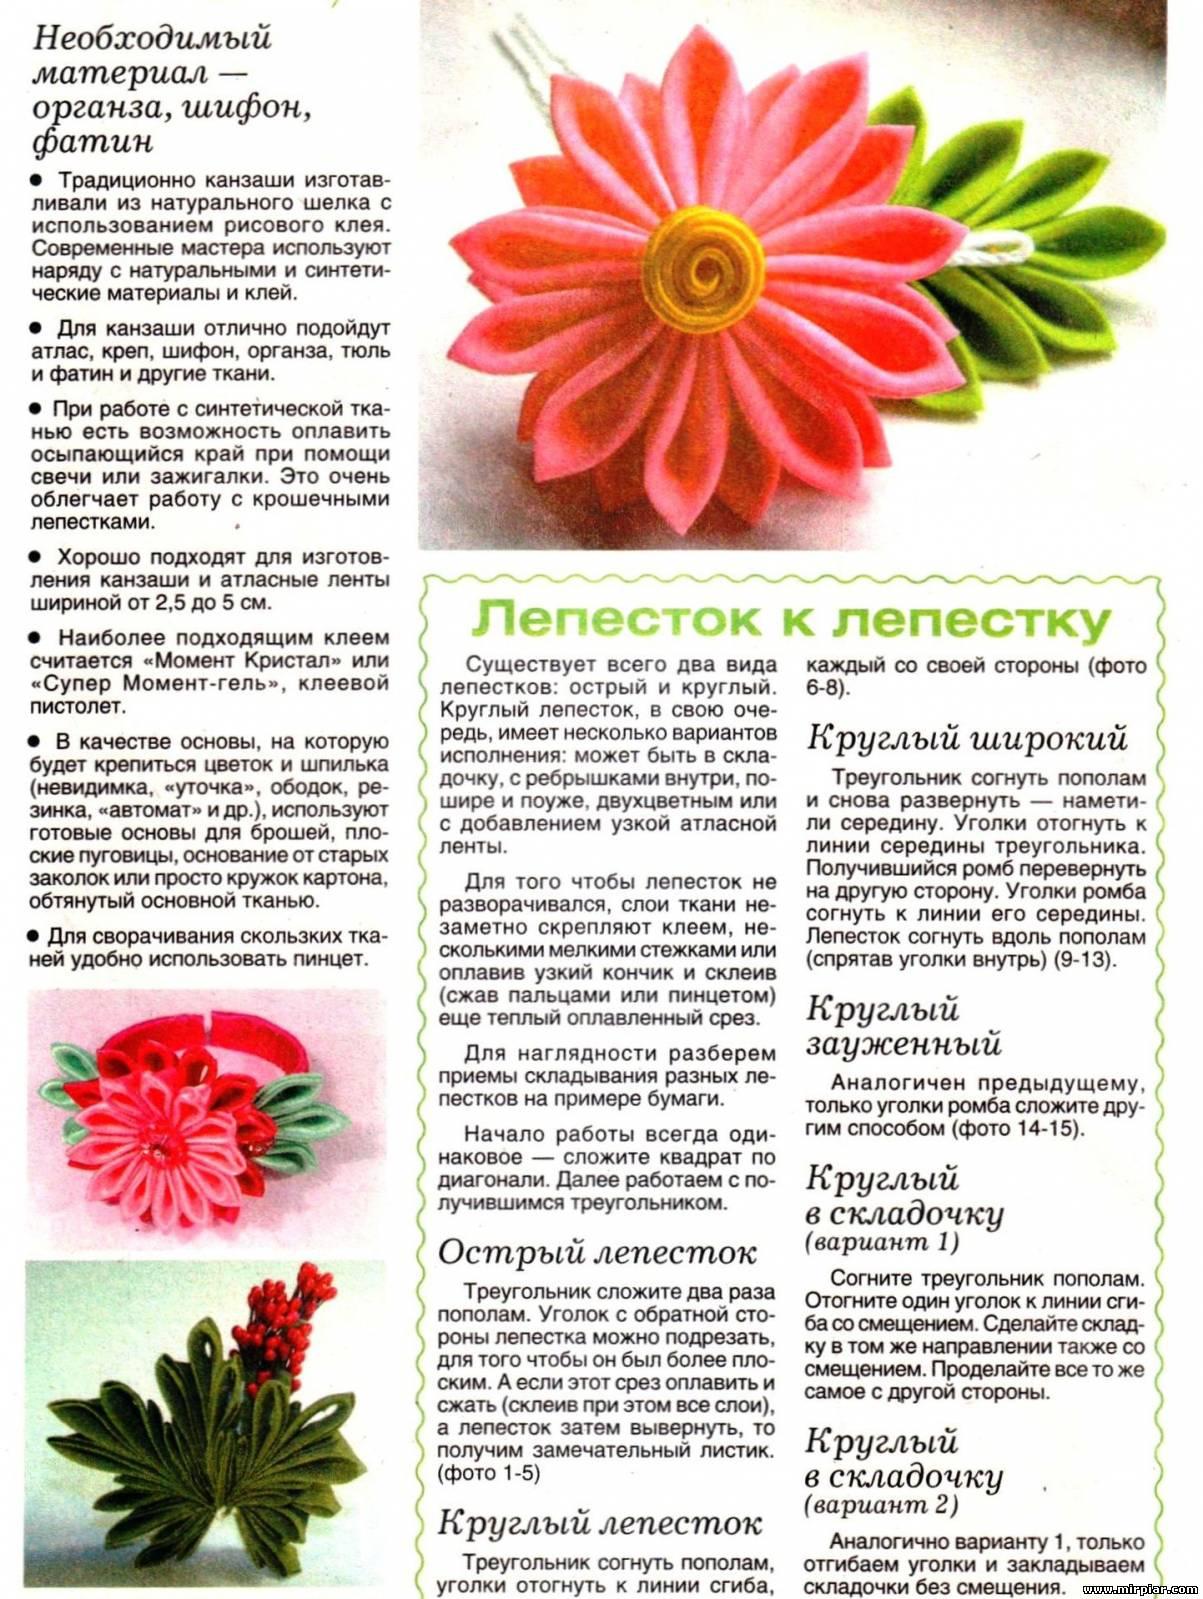 http://mirpiar.com/_ph/23/126961138.jpg